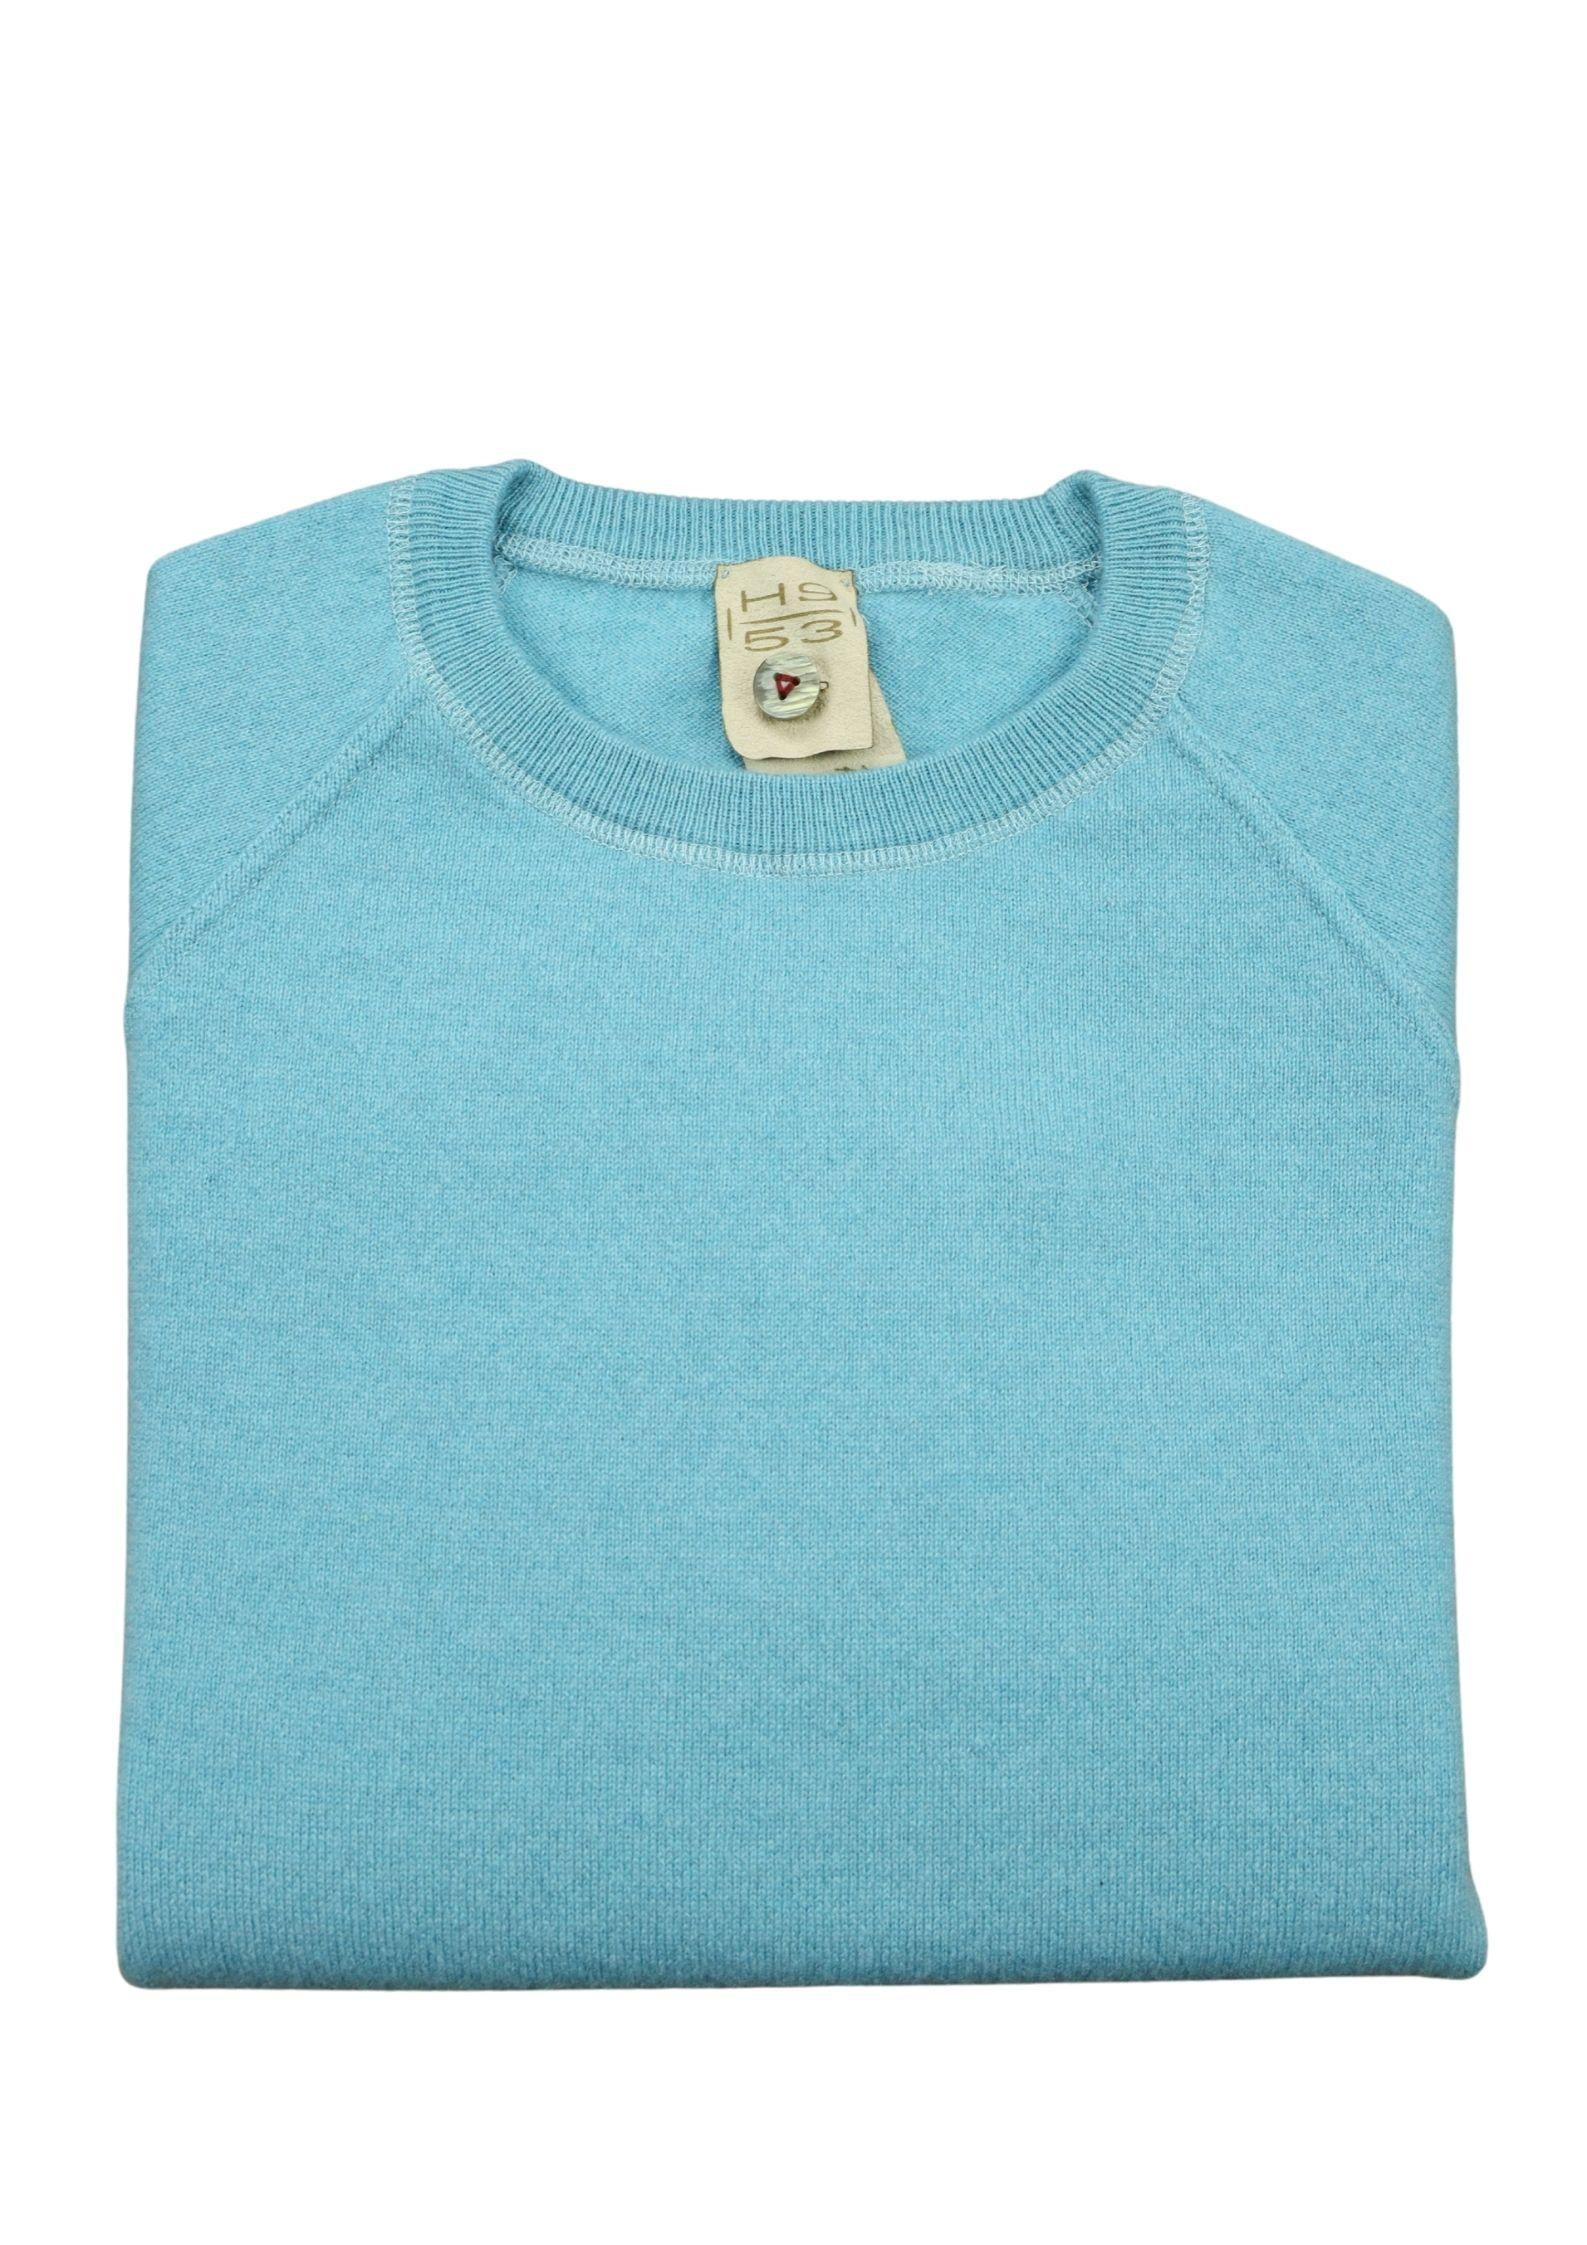 2  PLY CASHMERE SWEATERSWEAT STYLE H953 | Knitwear | 299668